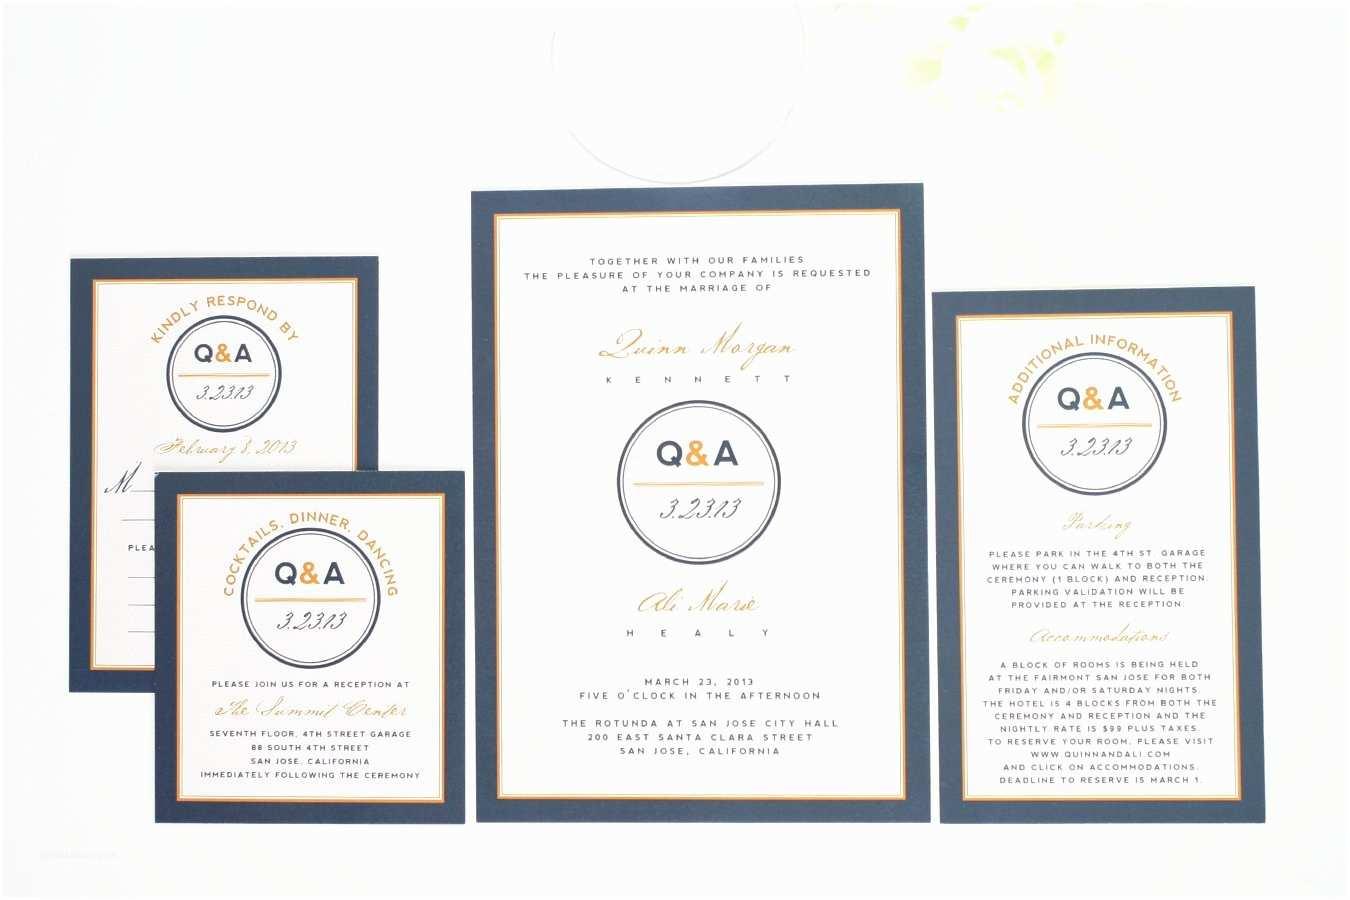 Blue and orange Wedding Invitations Contemporary Wedding Invitations In Navy Blue and orange